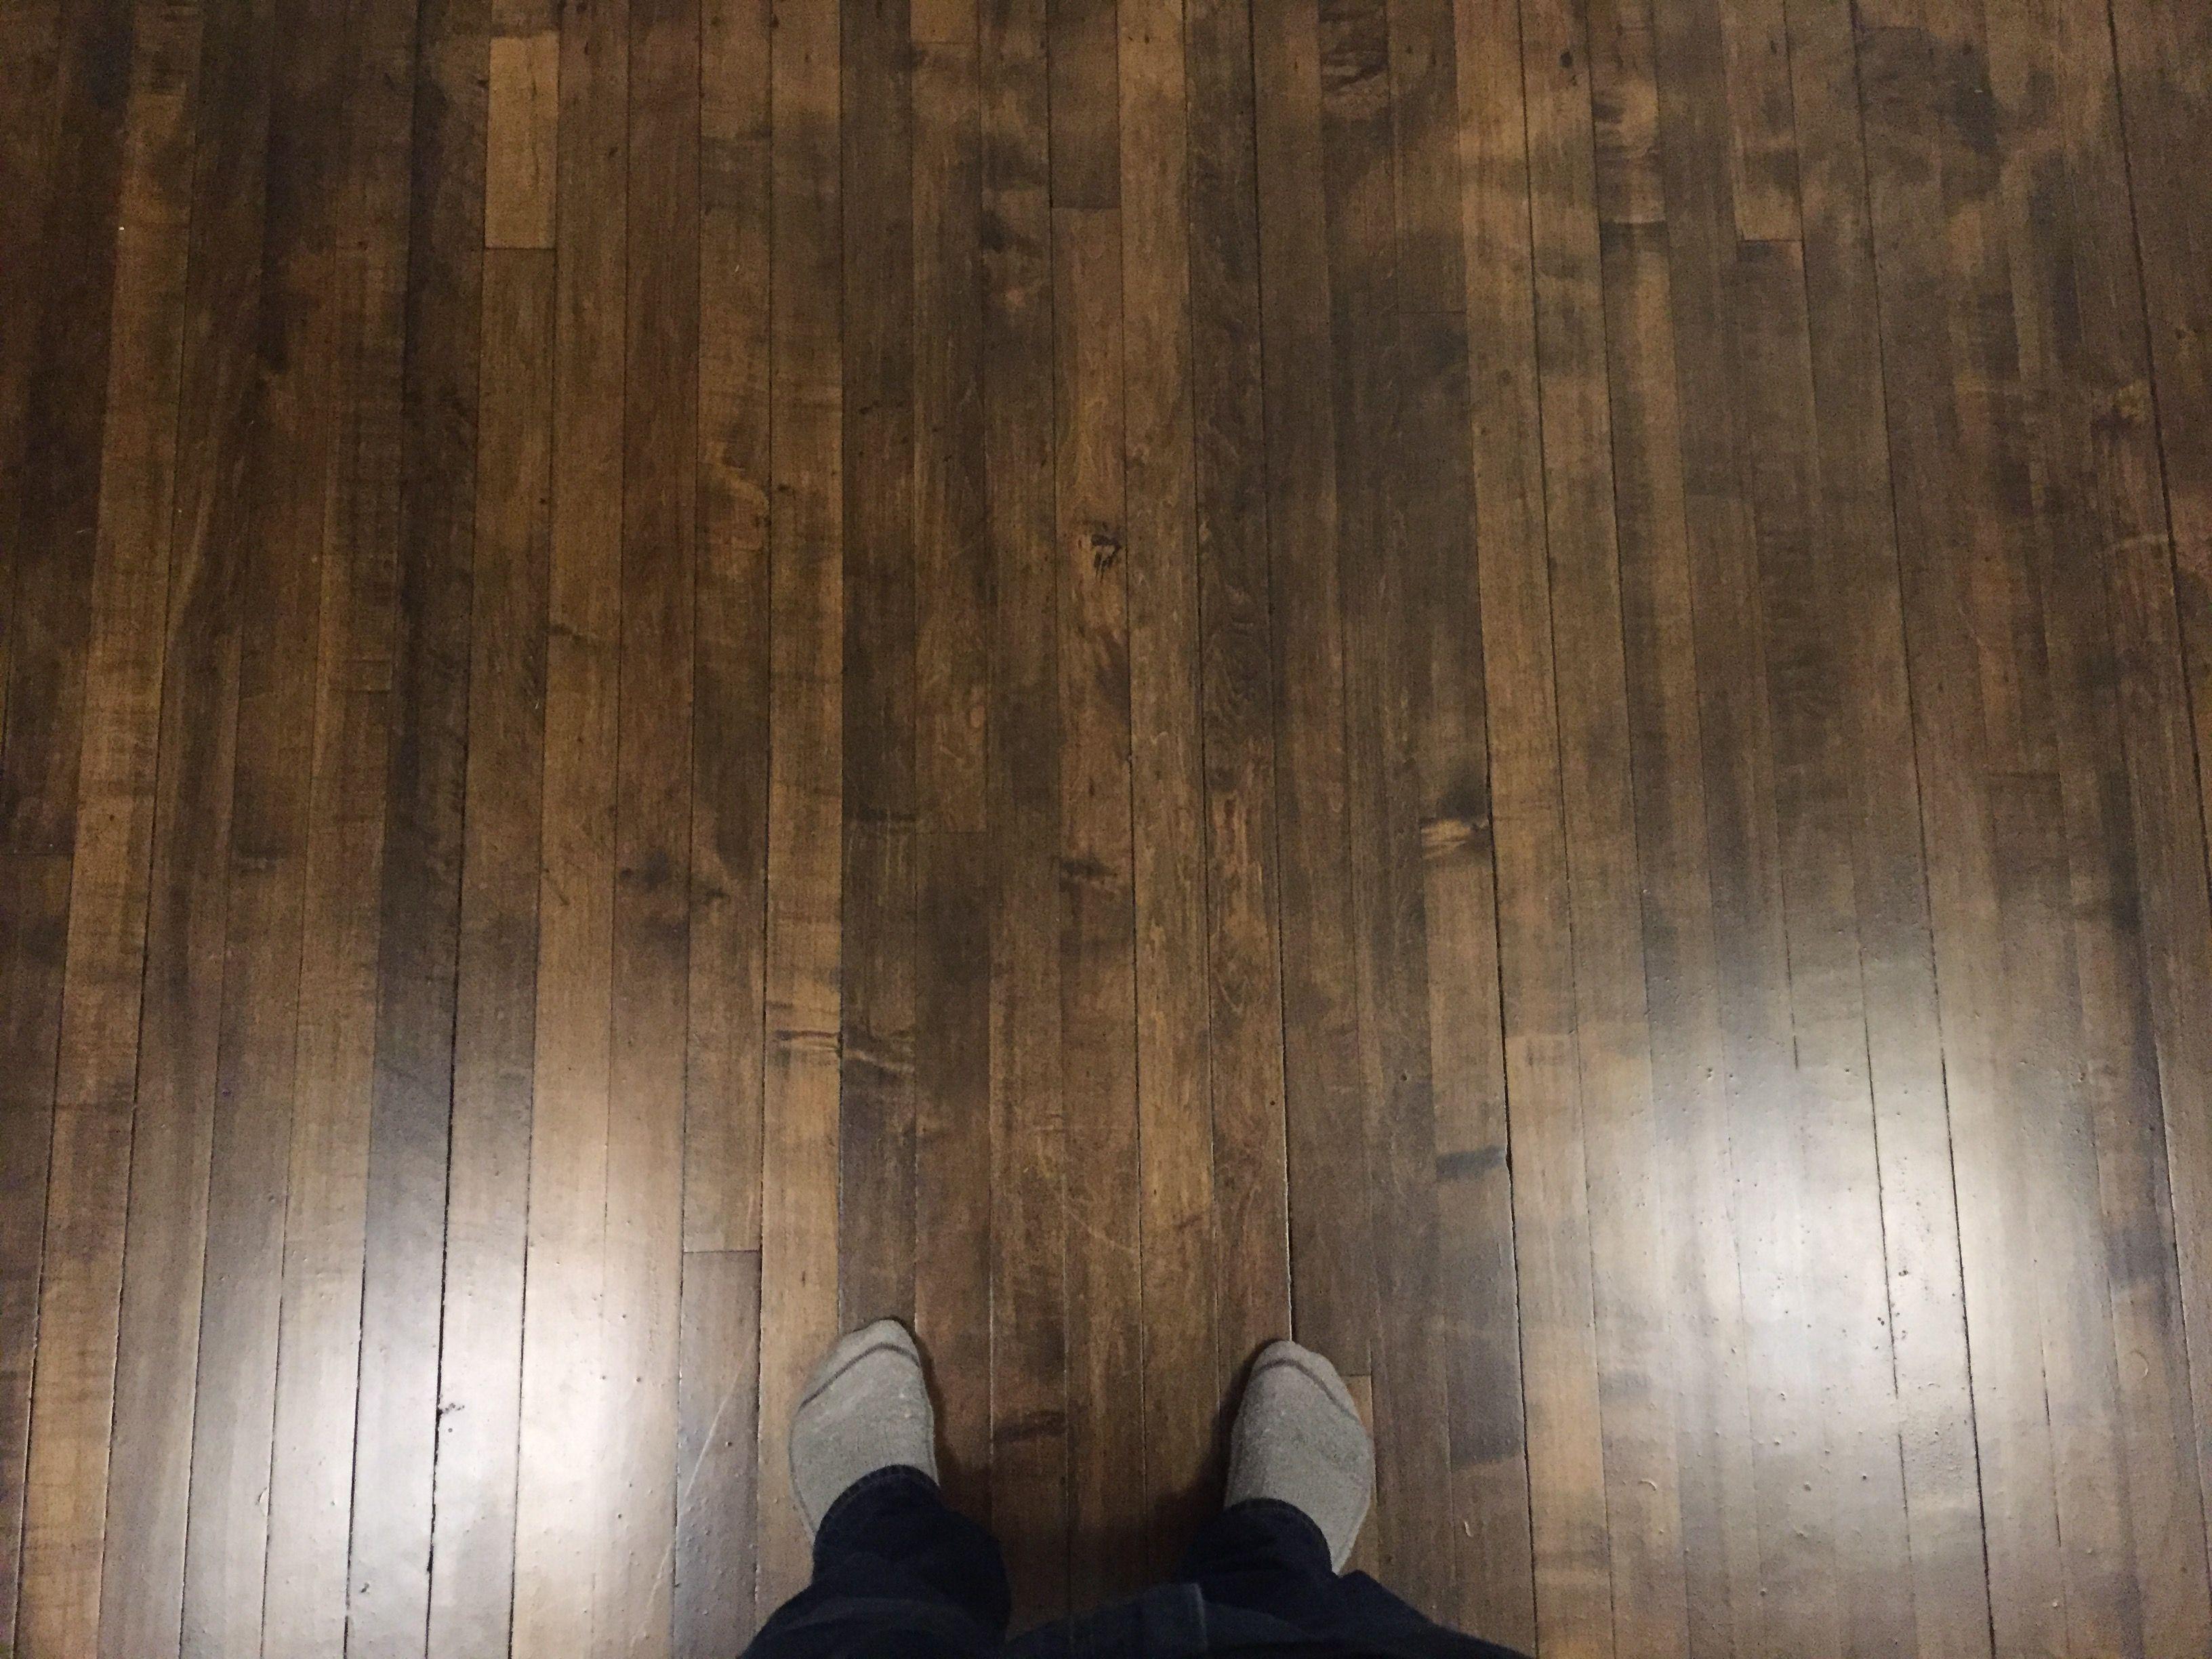 how to refinish hardwood floors youtube of how i stained my maple floors dark spoiler gel stain regarding 1540f28a28b06da1022cc61b0d2bda4d